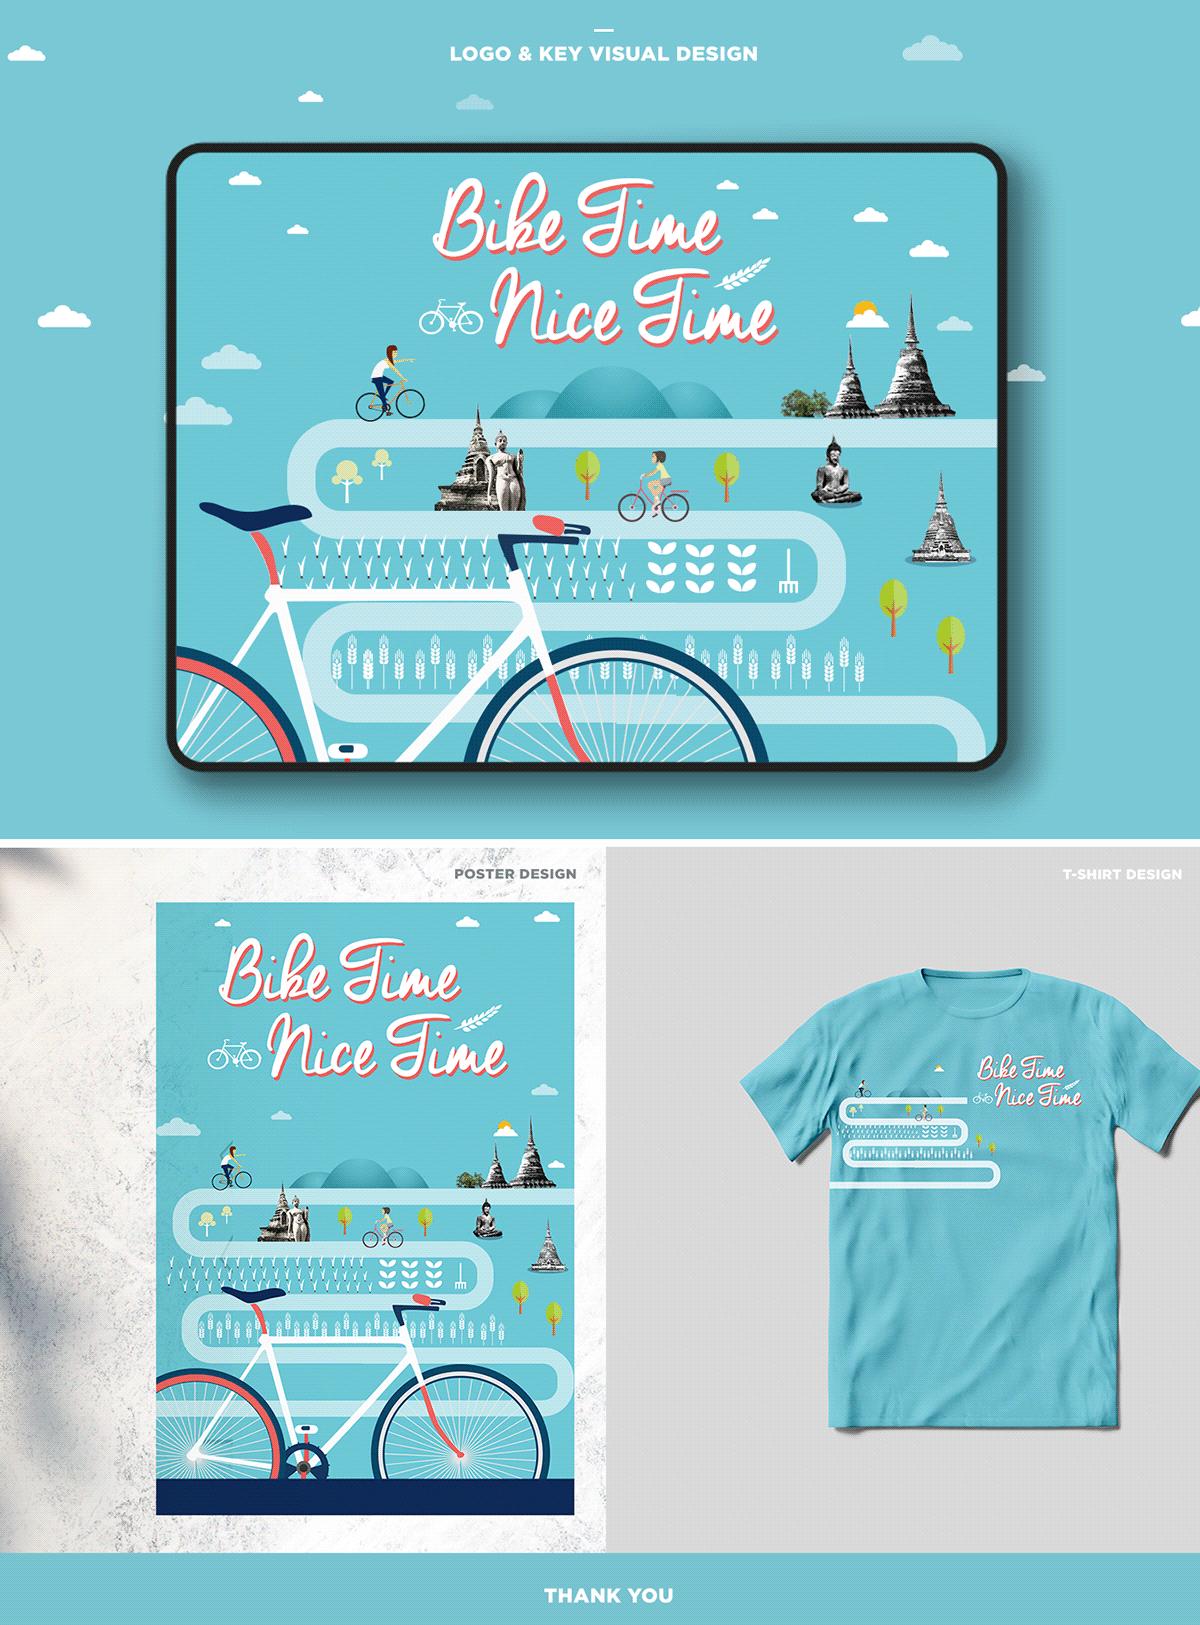 Bike blue campaign graphic design  Key Visual Design logo Poster Design T-Shirt Design